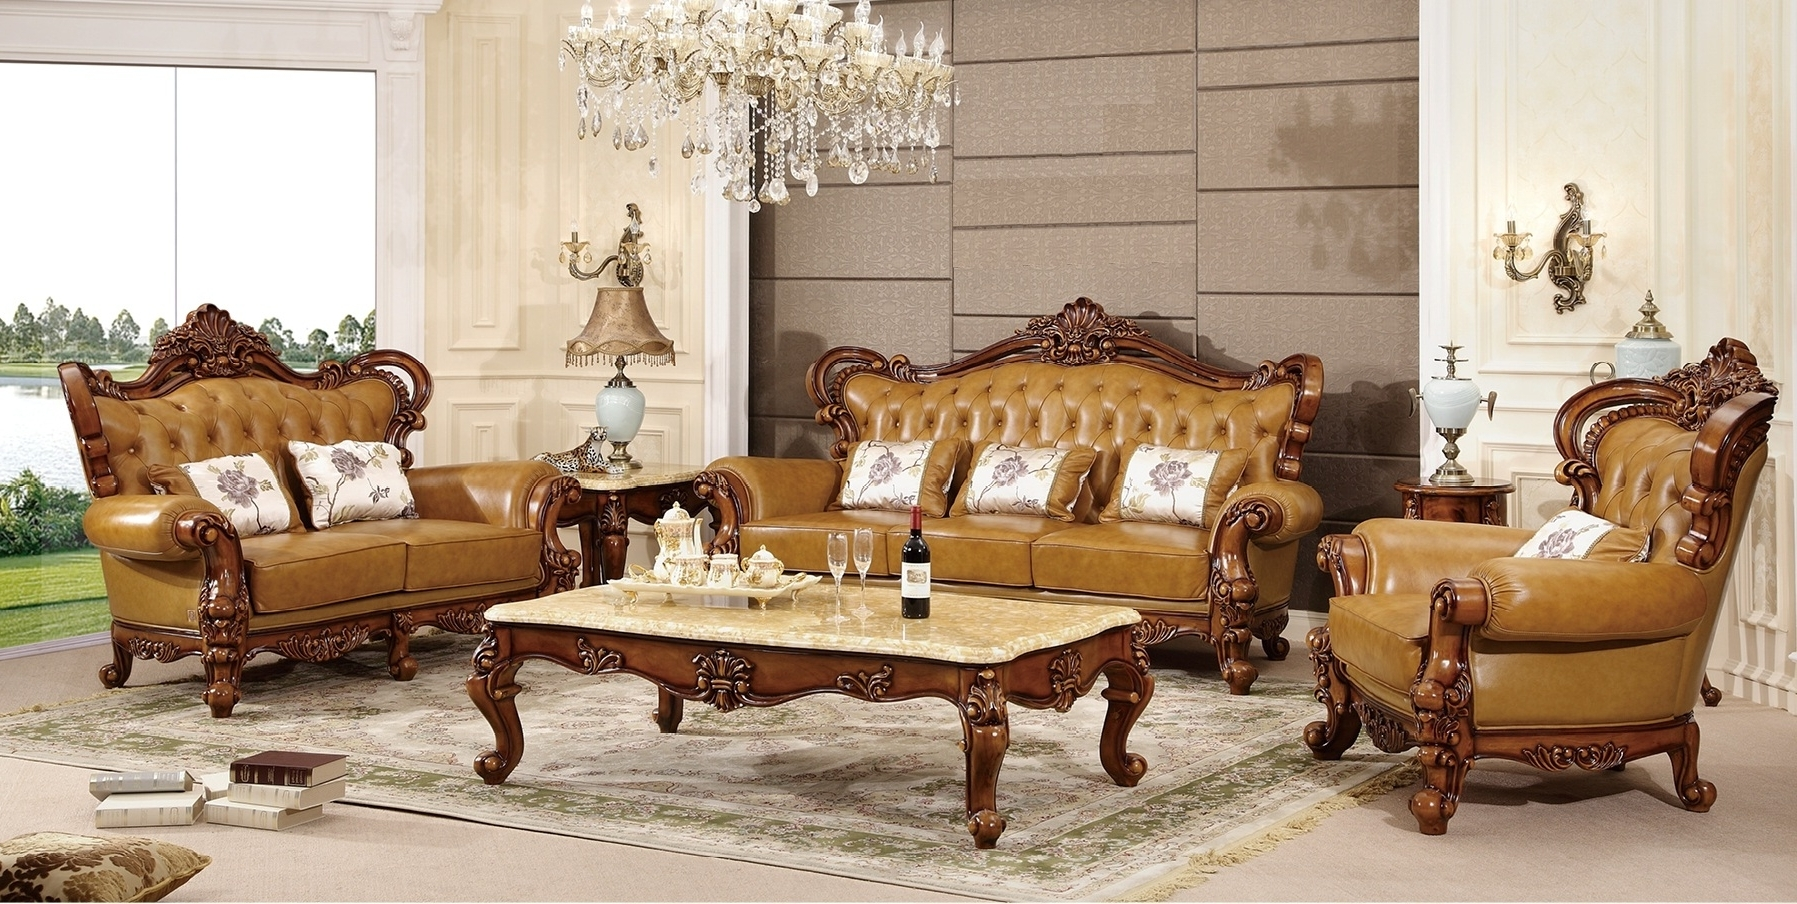 Most Recently Released Rotmans Furniture Worcester Ma Jordans Sectional Sofas Jordan's Intended For Jordans Sectional Sofas (View 7 of 20)